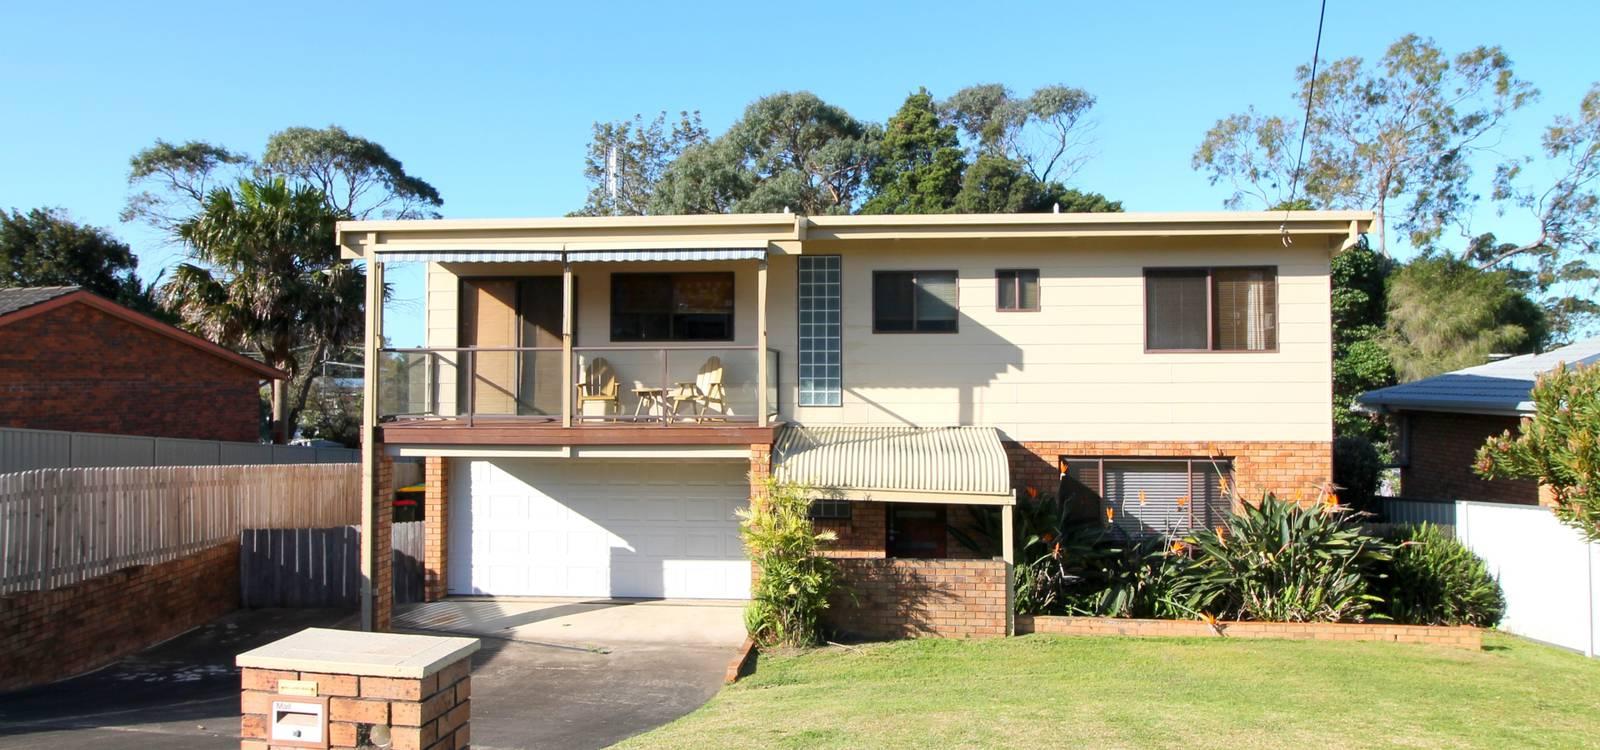 18 Gould  Street TUROSS HEAD, NSW 2537 - photo 1